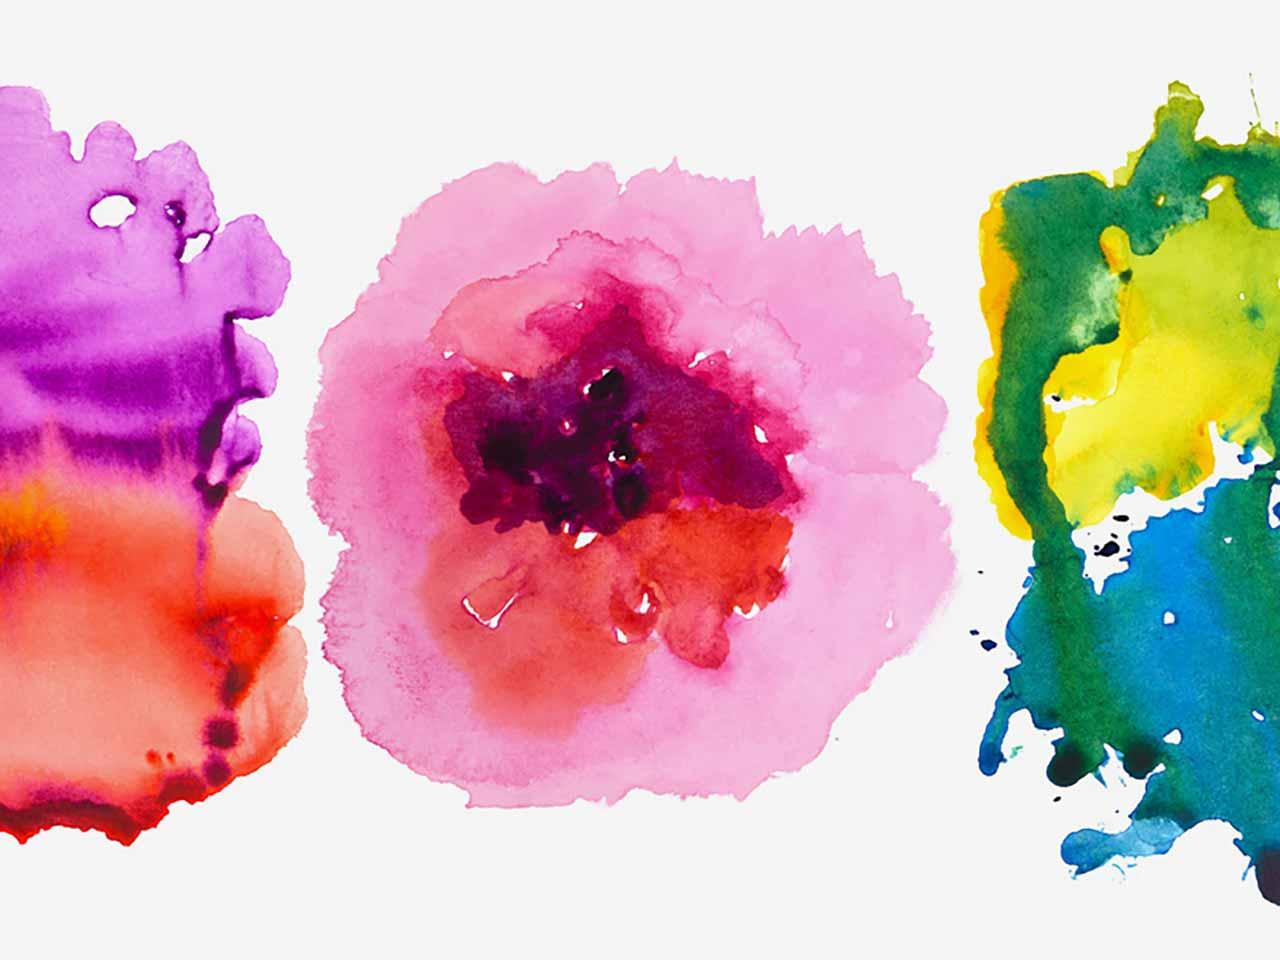 6 Watercolor Textures vol. 3